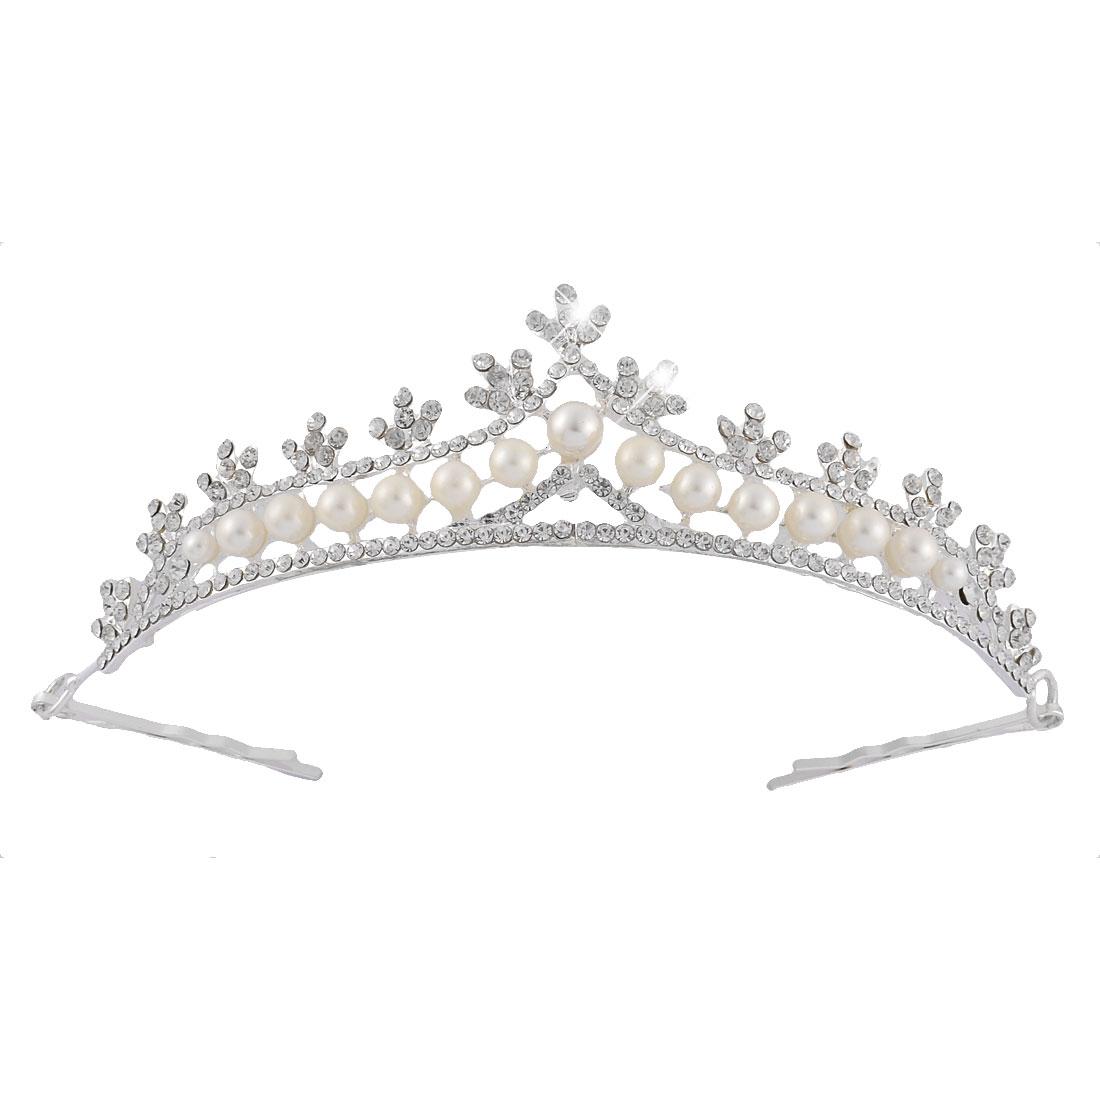 Wedding Bride Rhinestone Imitation Pearl Crown Tiara Headpiece Frontlet Silver Tone